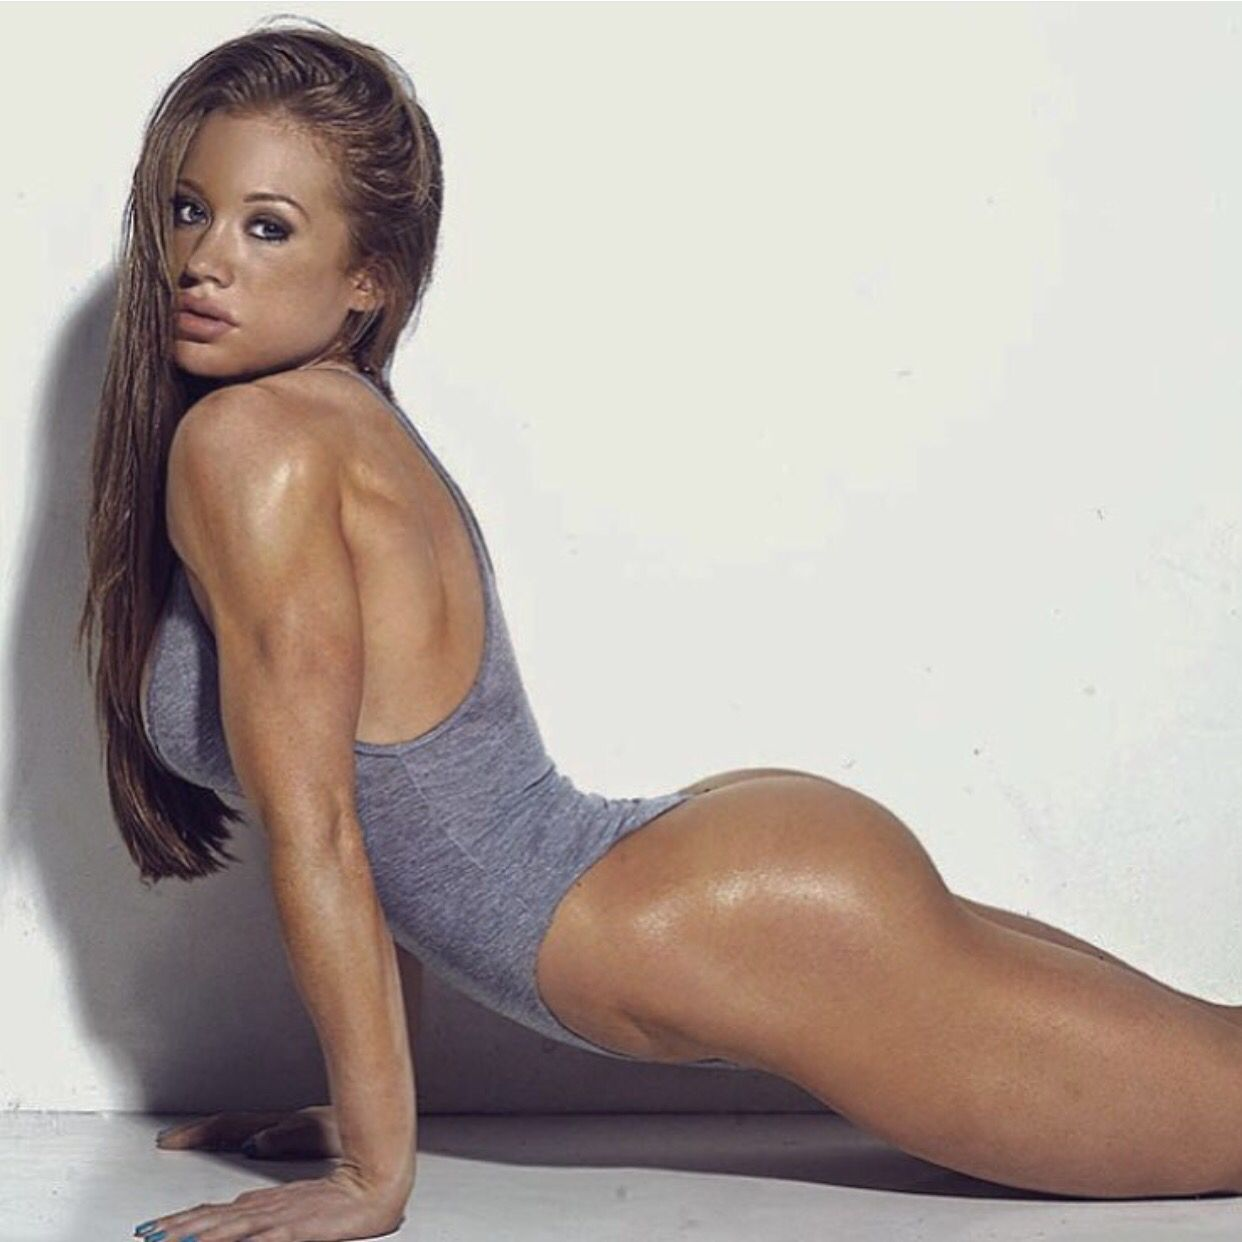 Feet Samantha Skolkin nudes (54 foto and video), Topless, Cleavage, Feet, swimsuit 2017